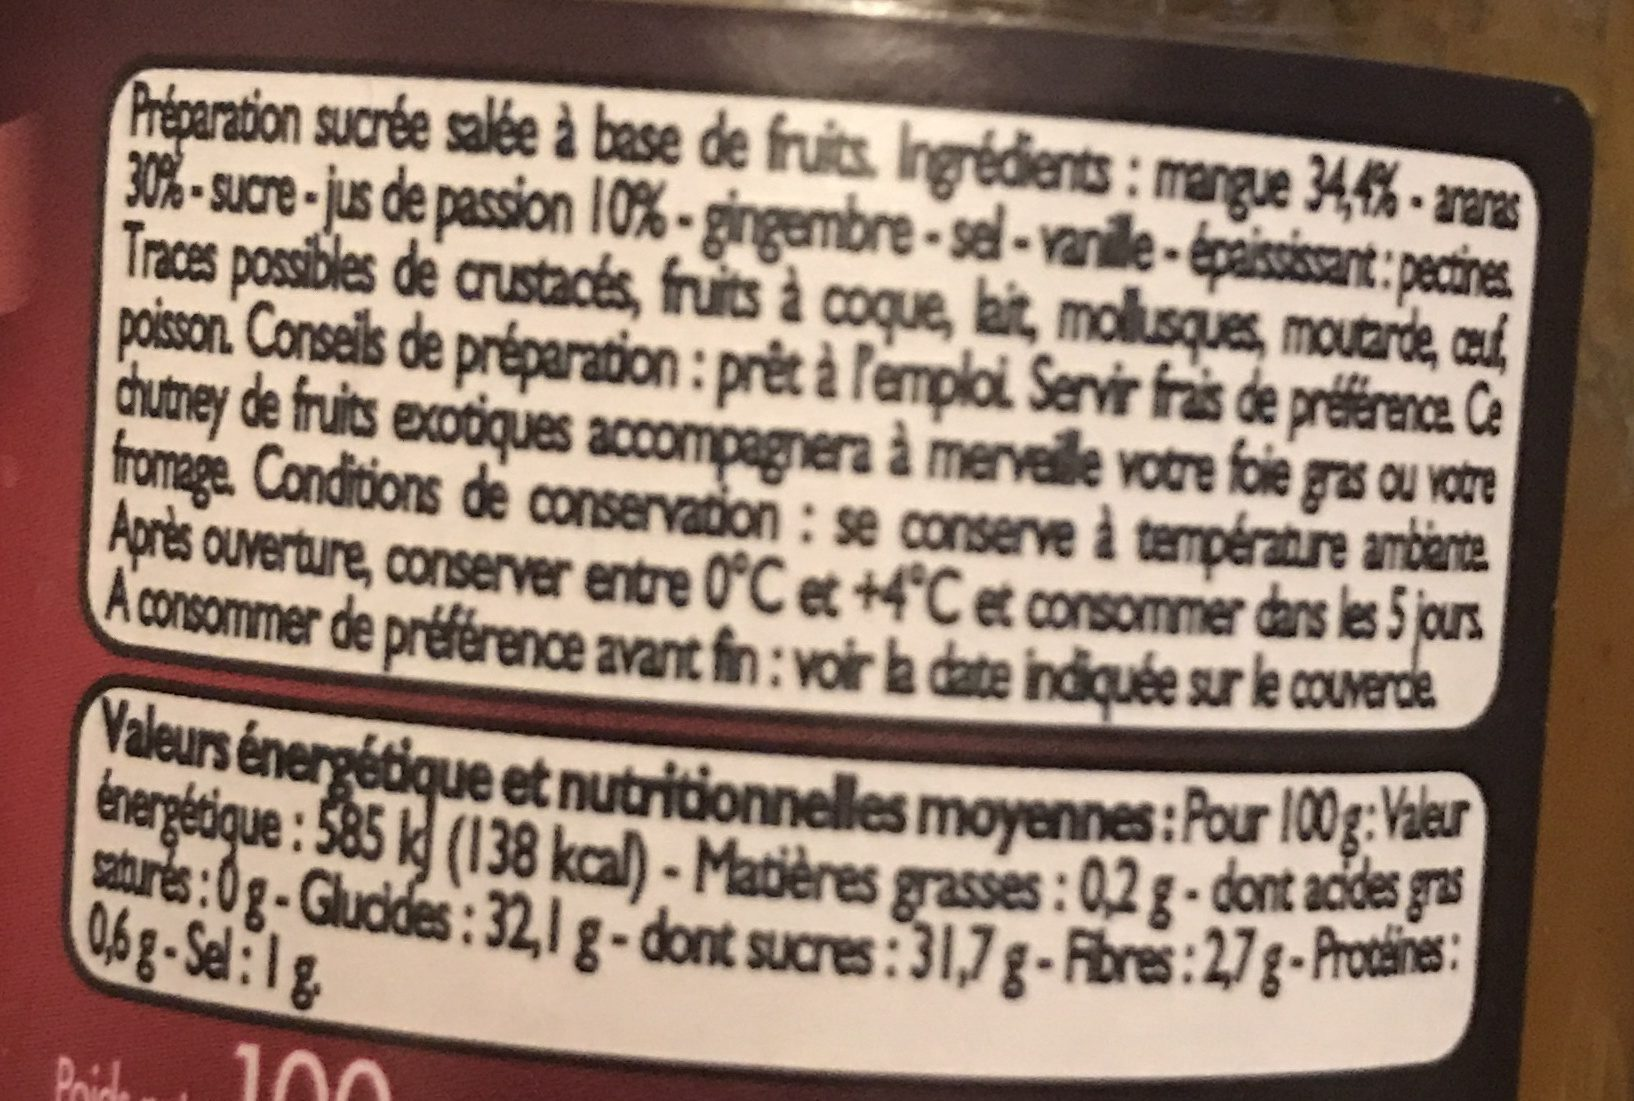 Chutney mangue ananas passion - Ingrédients - fr